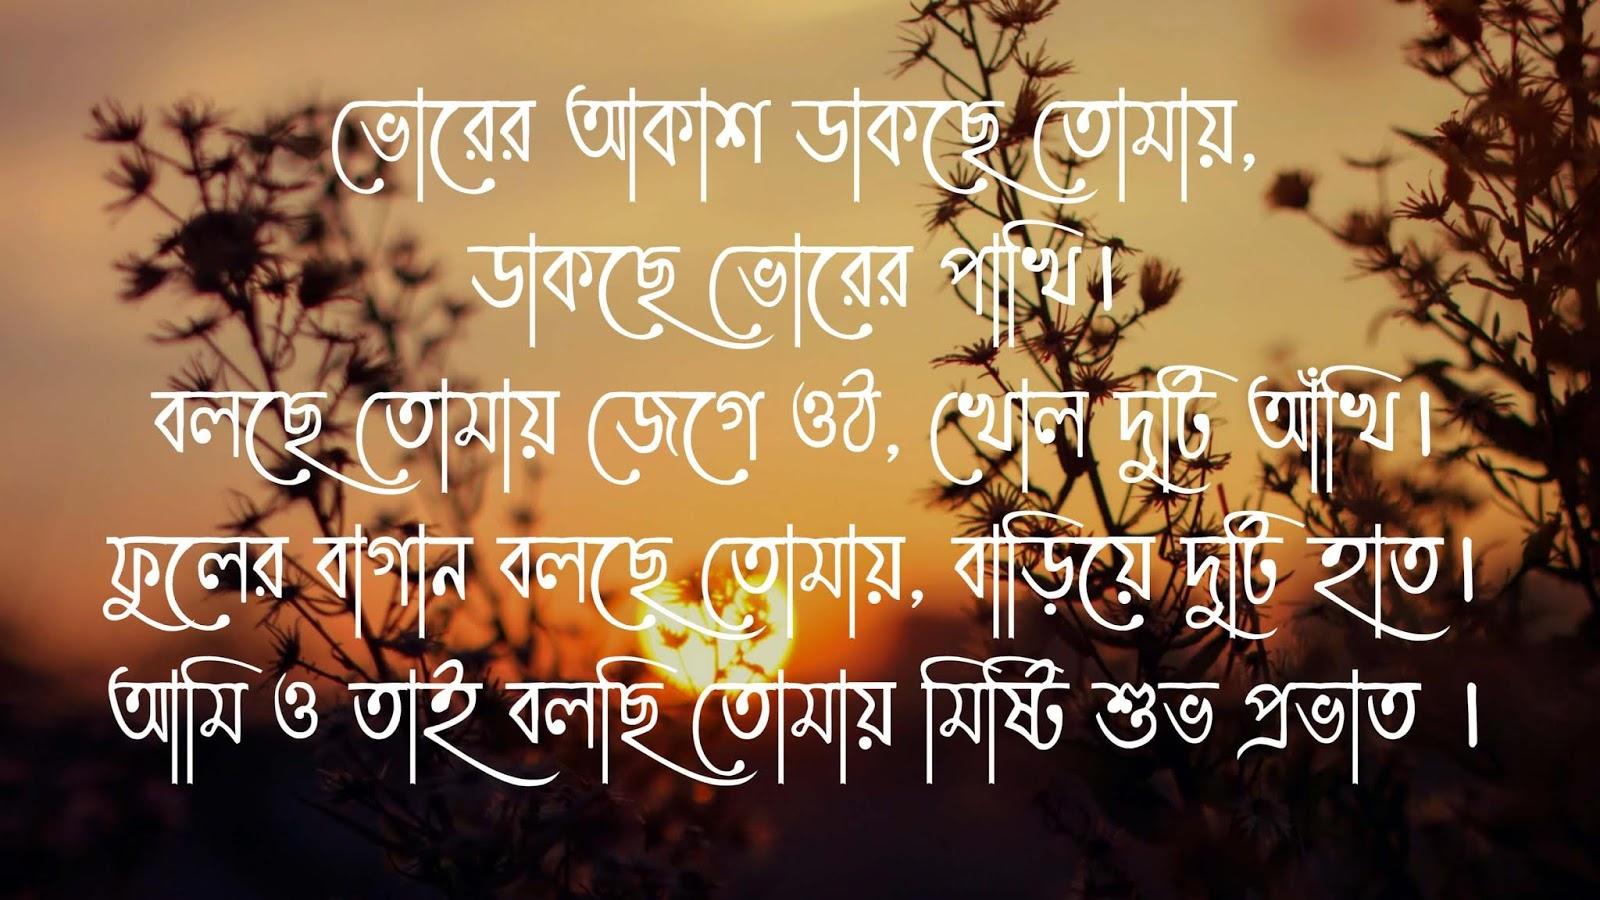 Subha Sakal